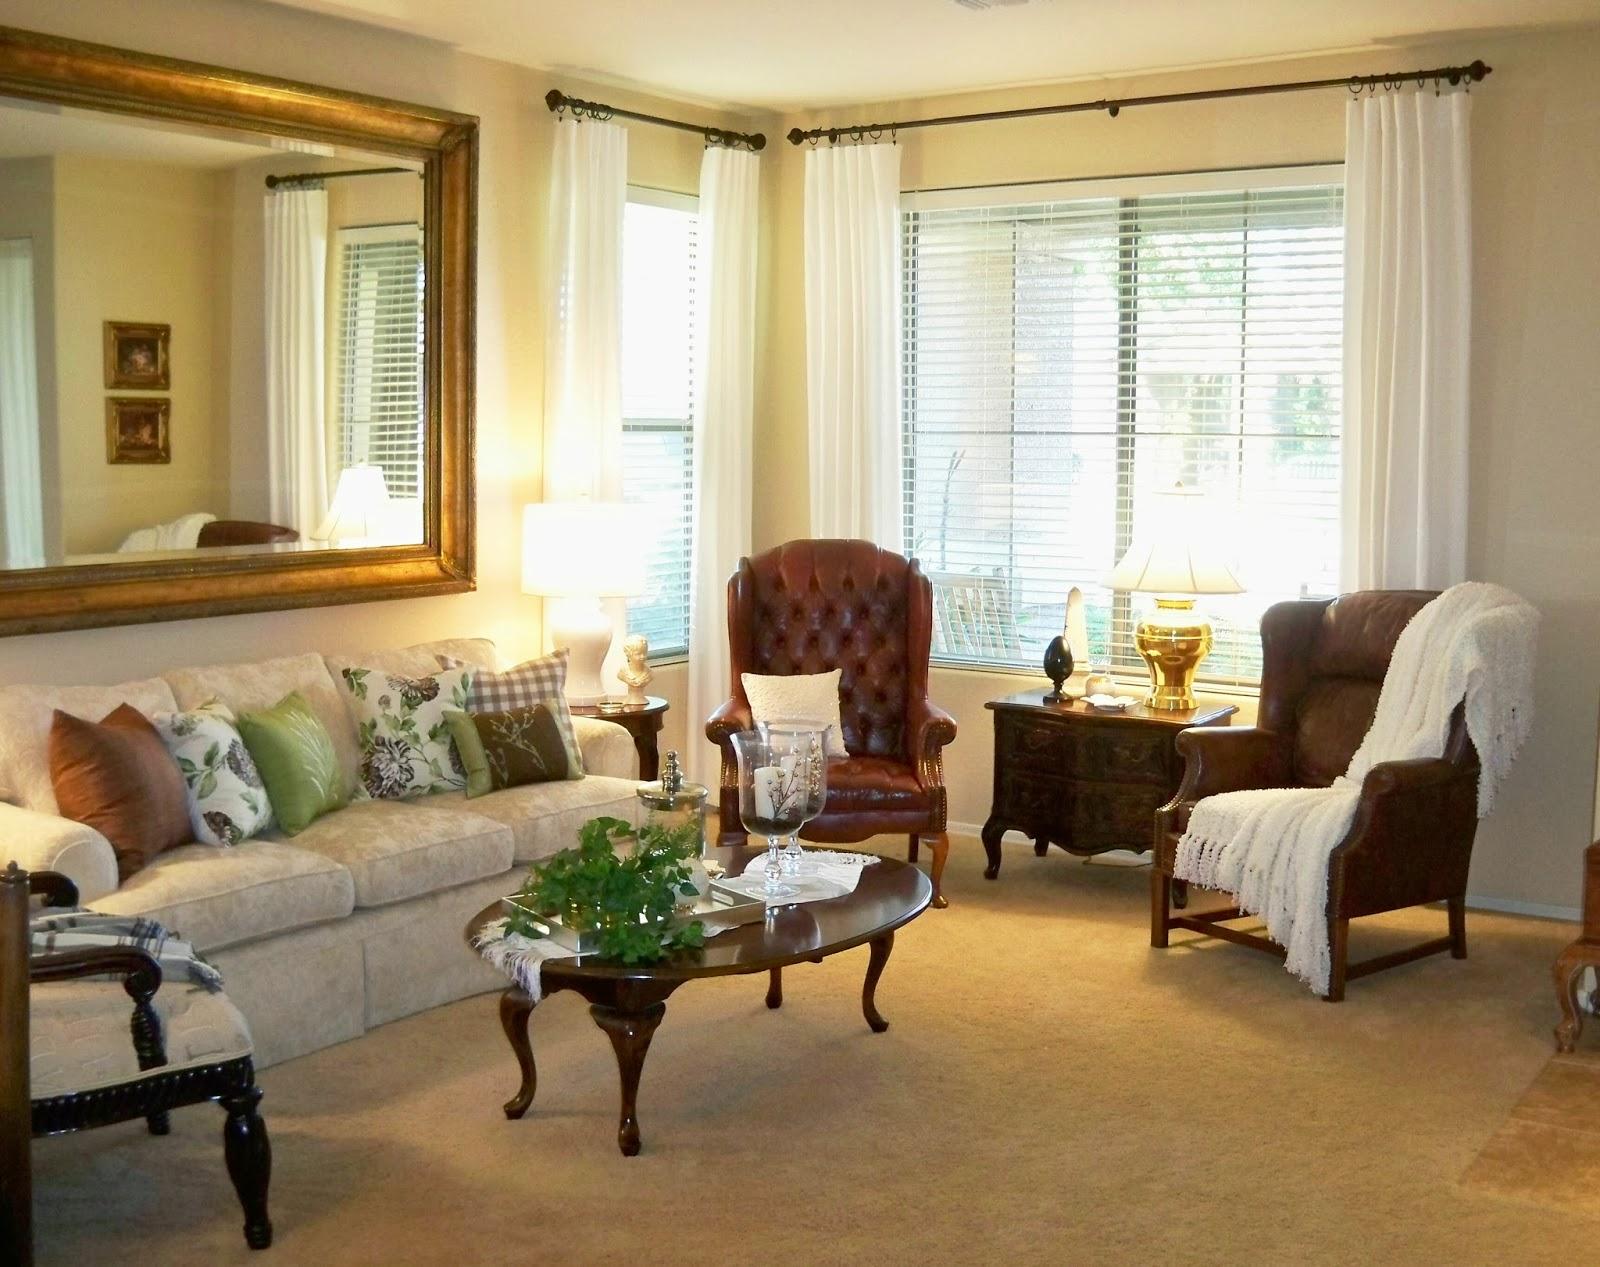 A Stroll Thru Life: Living Room Makeover Begins